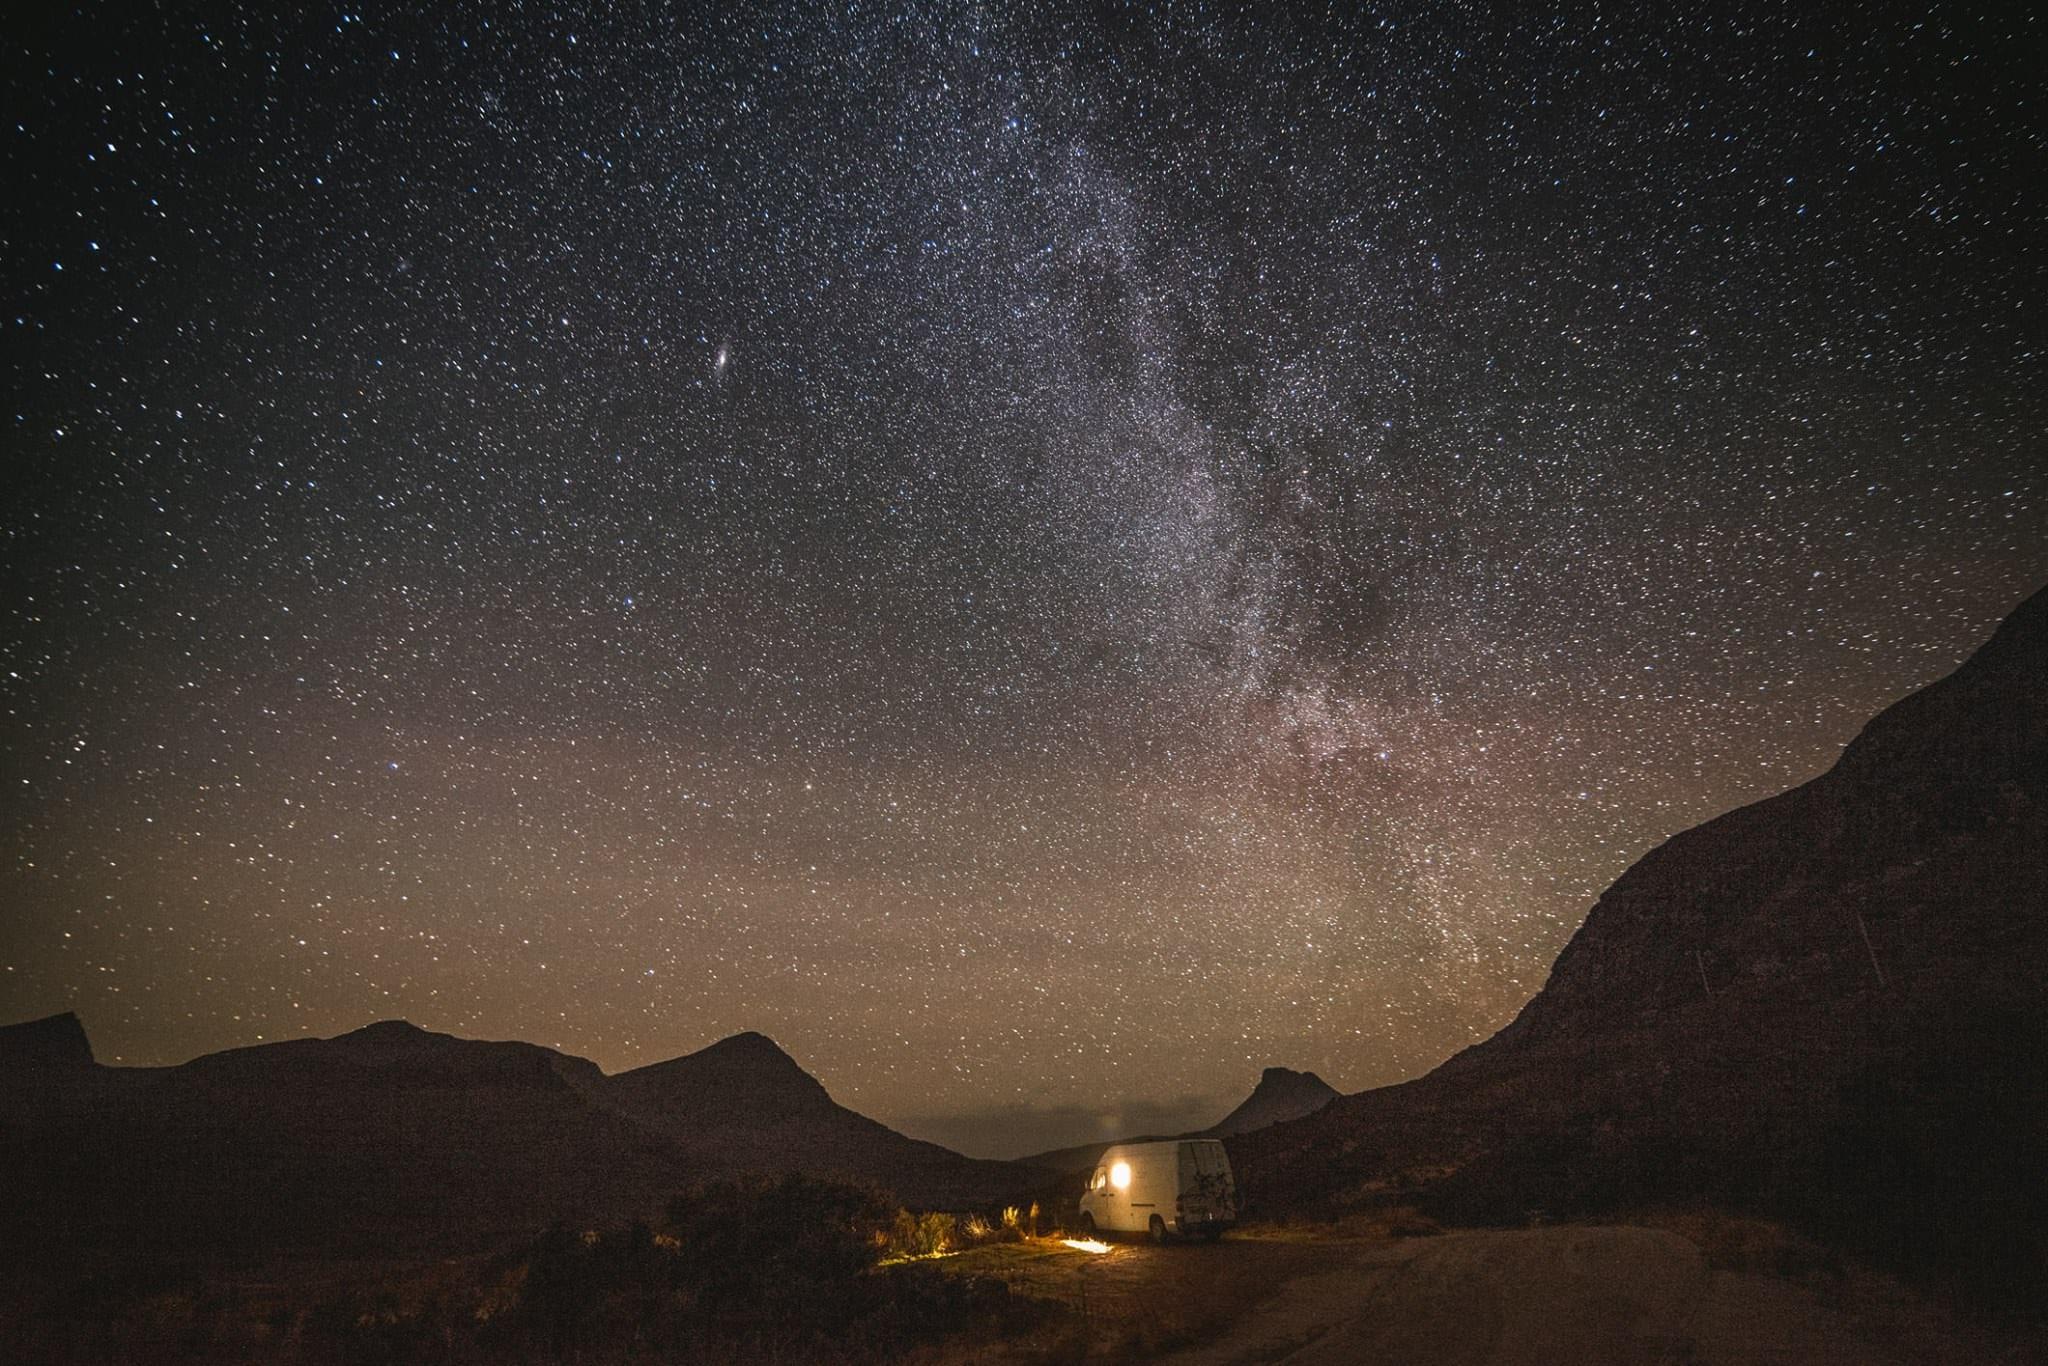 A starry night in Ireland